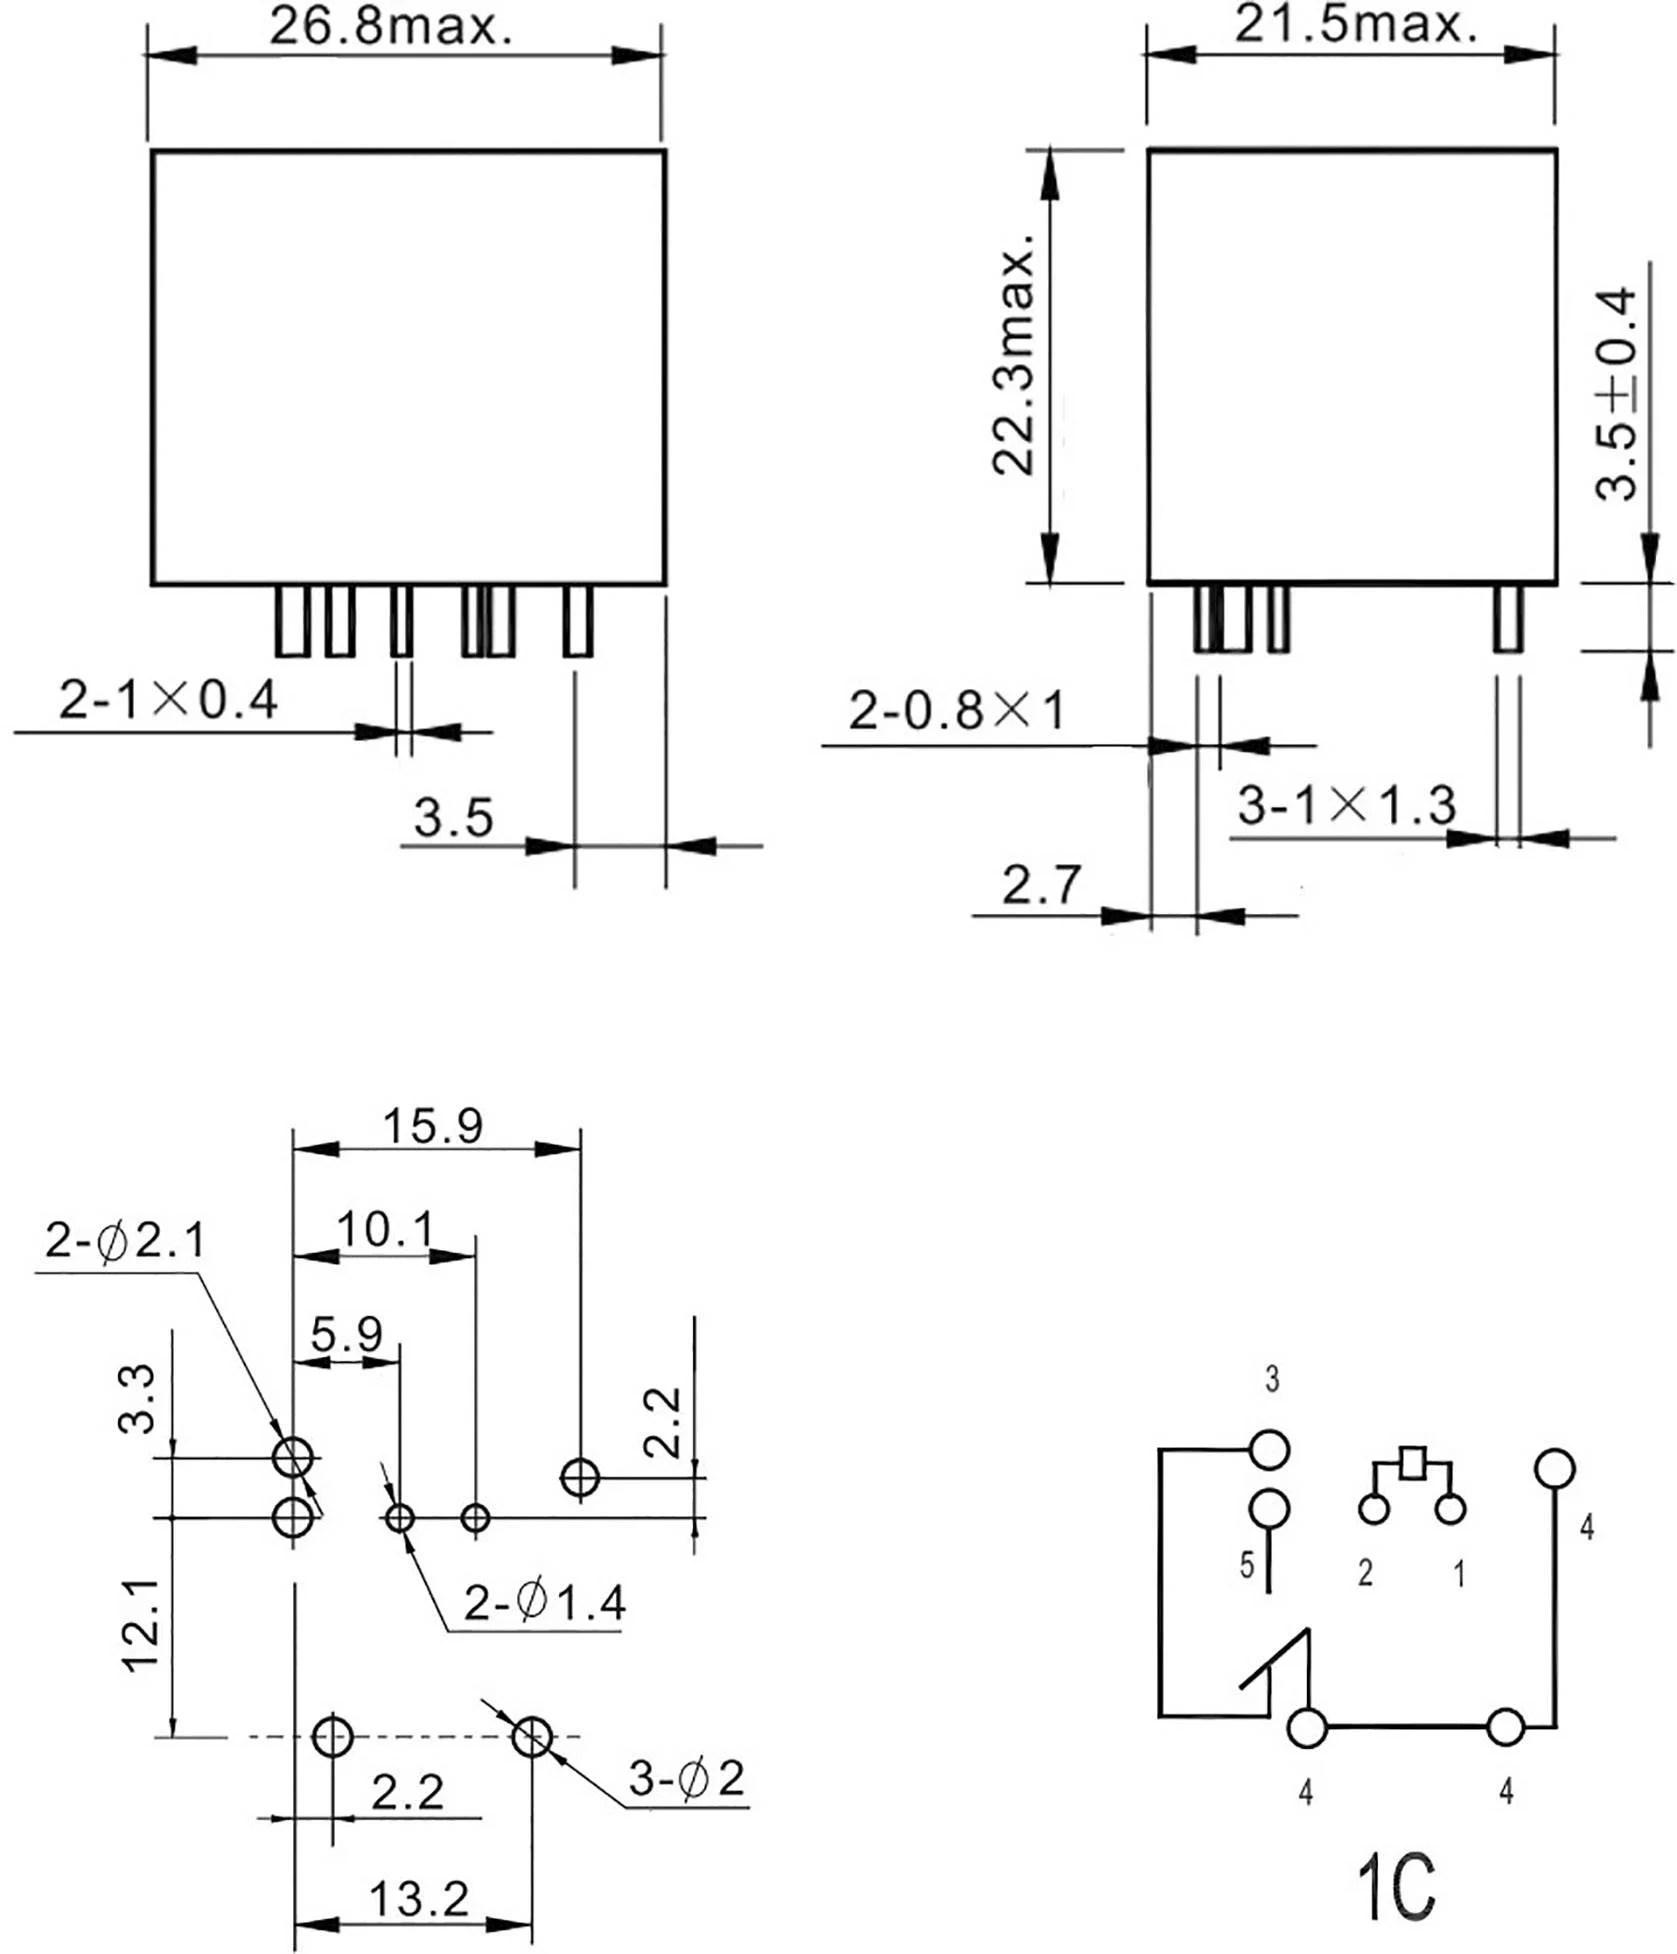 Fic Fra2c S2 Dc24v Automotive Relay 24 Vdc 40 A 1 Change